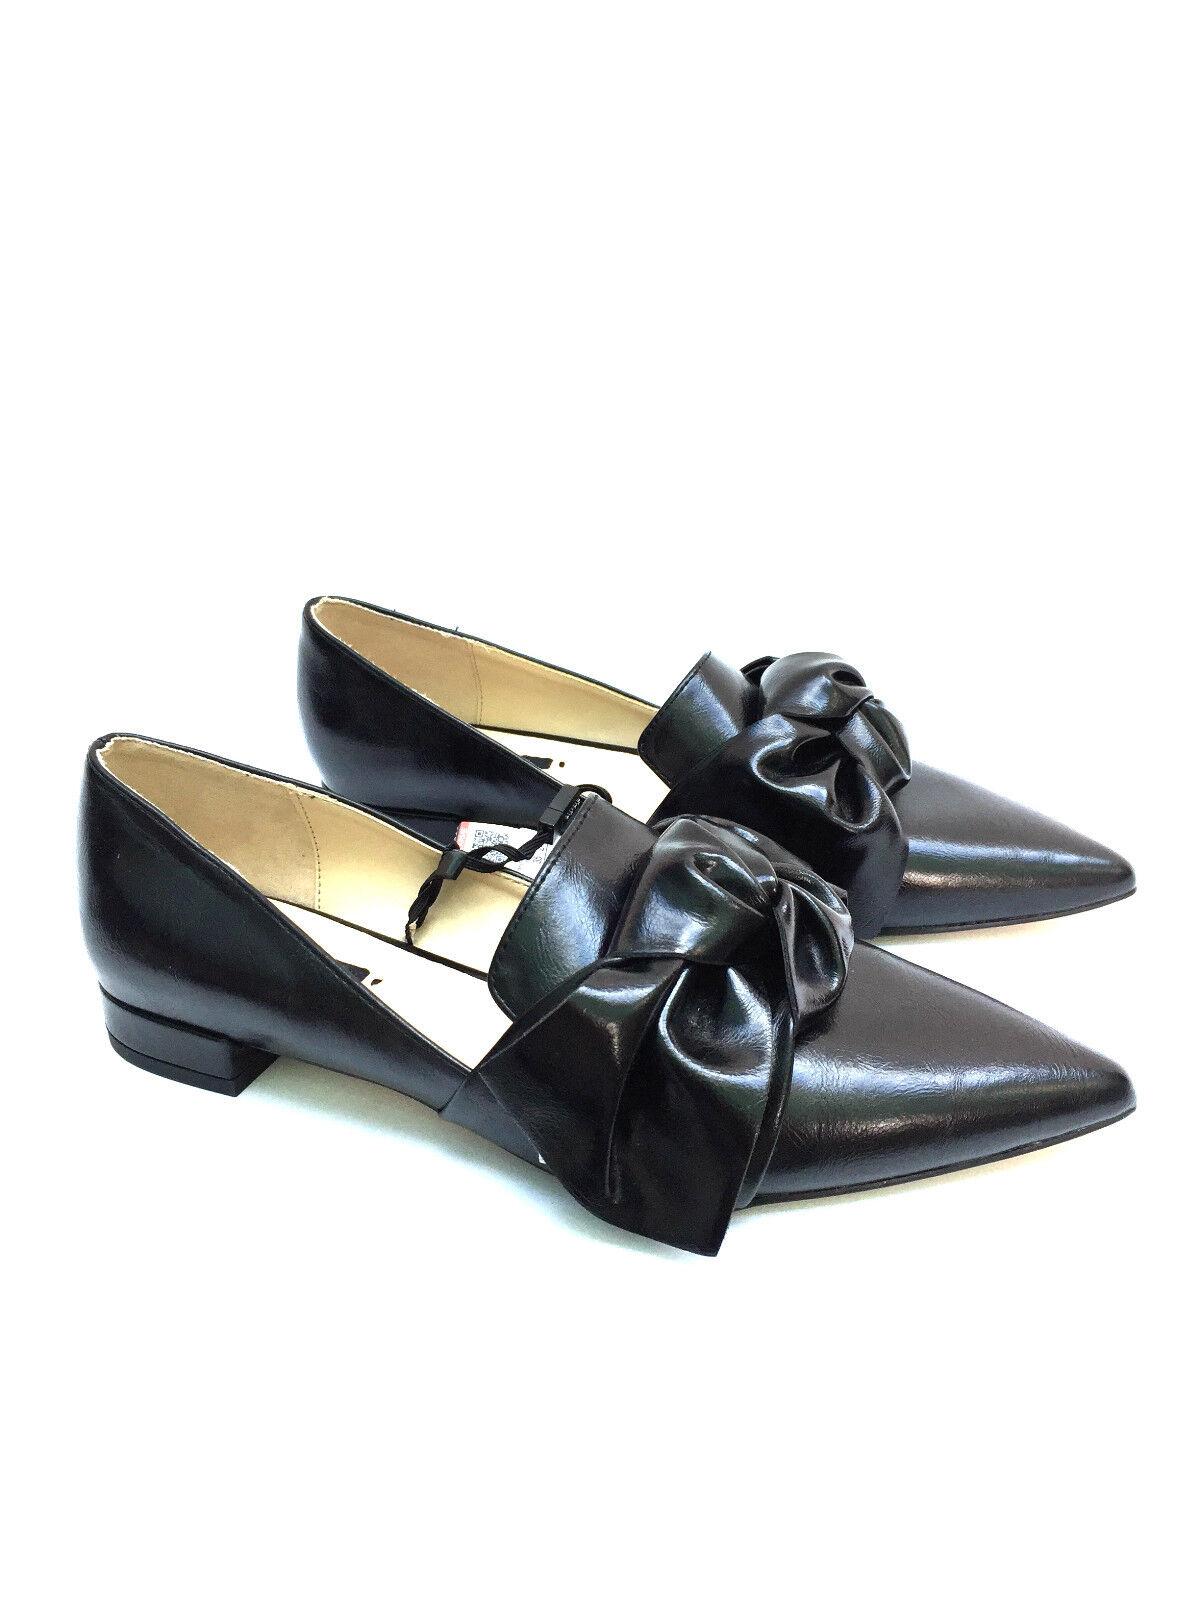 Zara Punta Afilada Plano Zapatos con Tamaño de de de Arco UK3 EUR36 US6 Ref. 2408 202  garantía de crédito